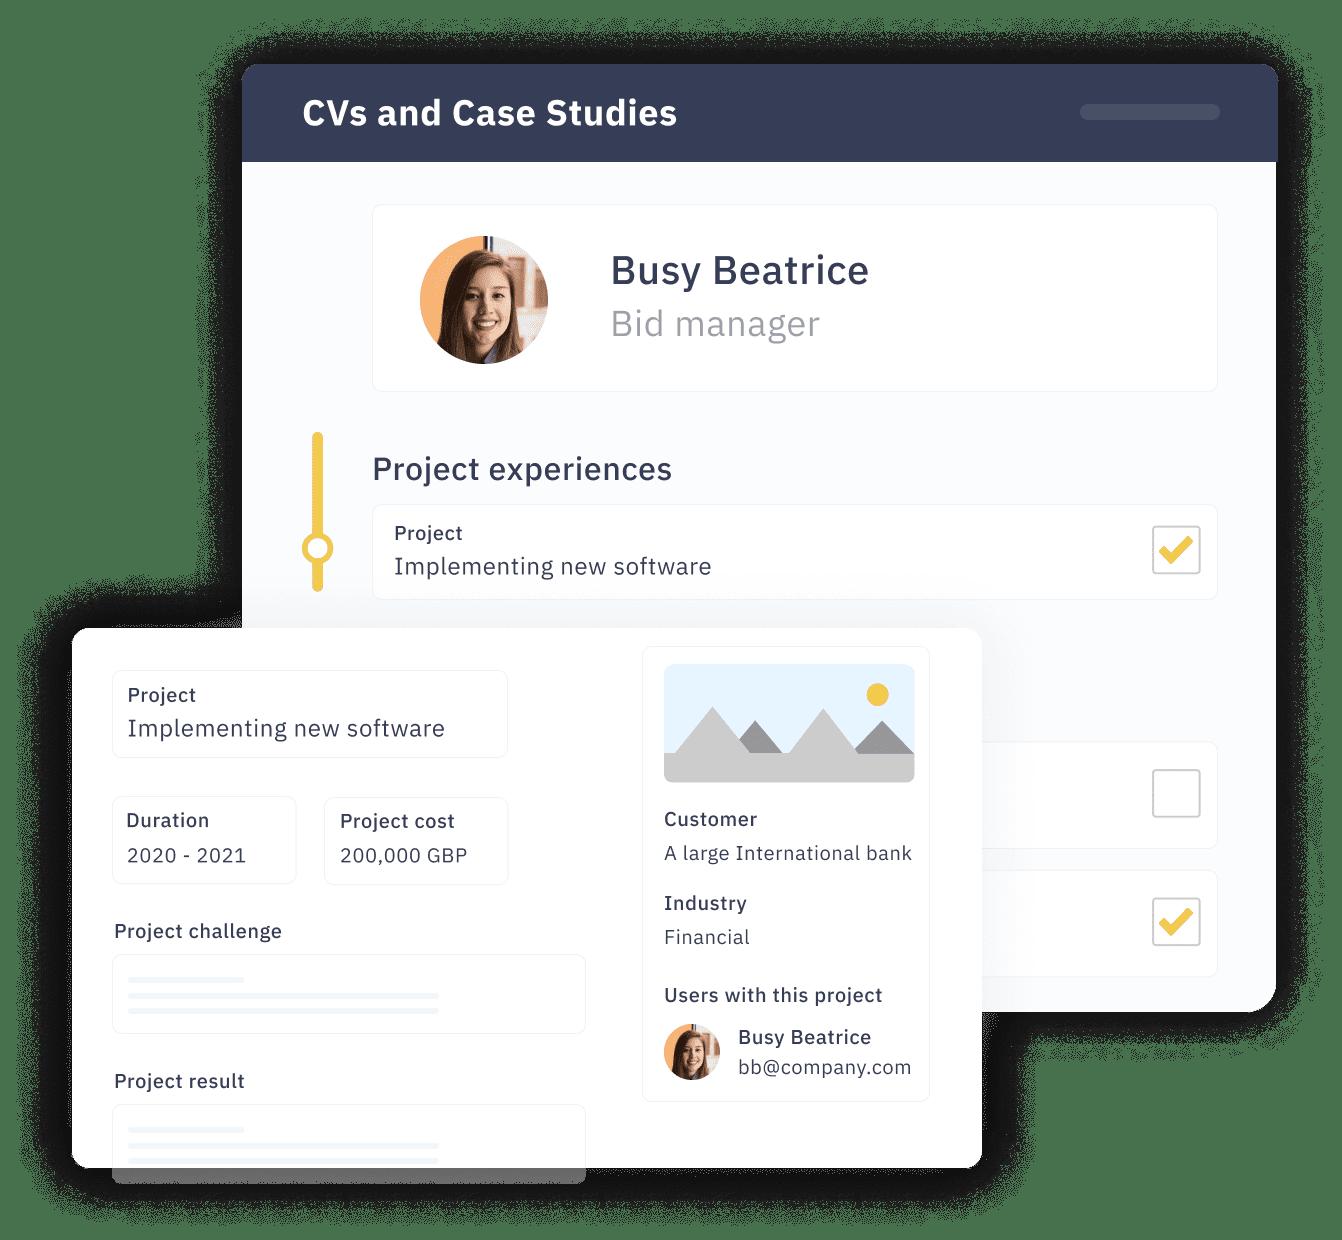 CVs and Case studies